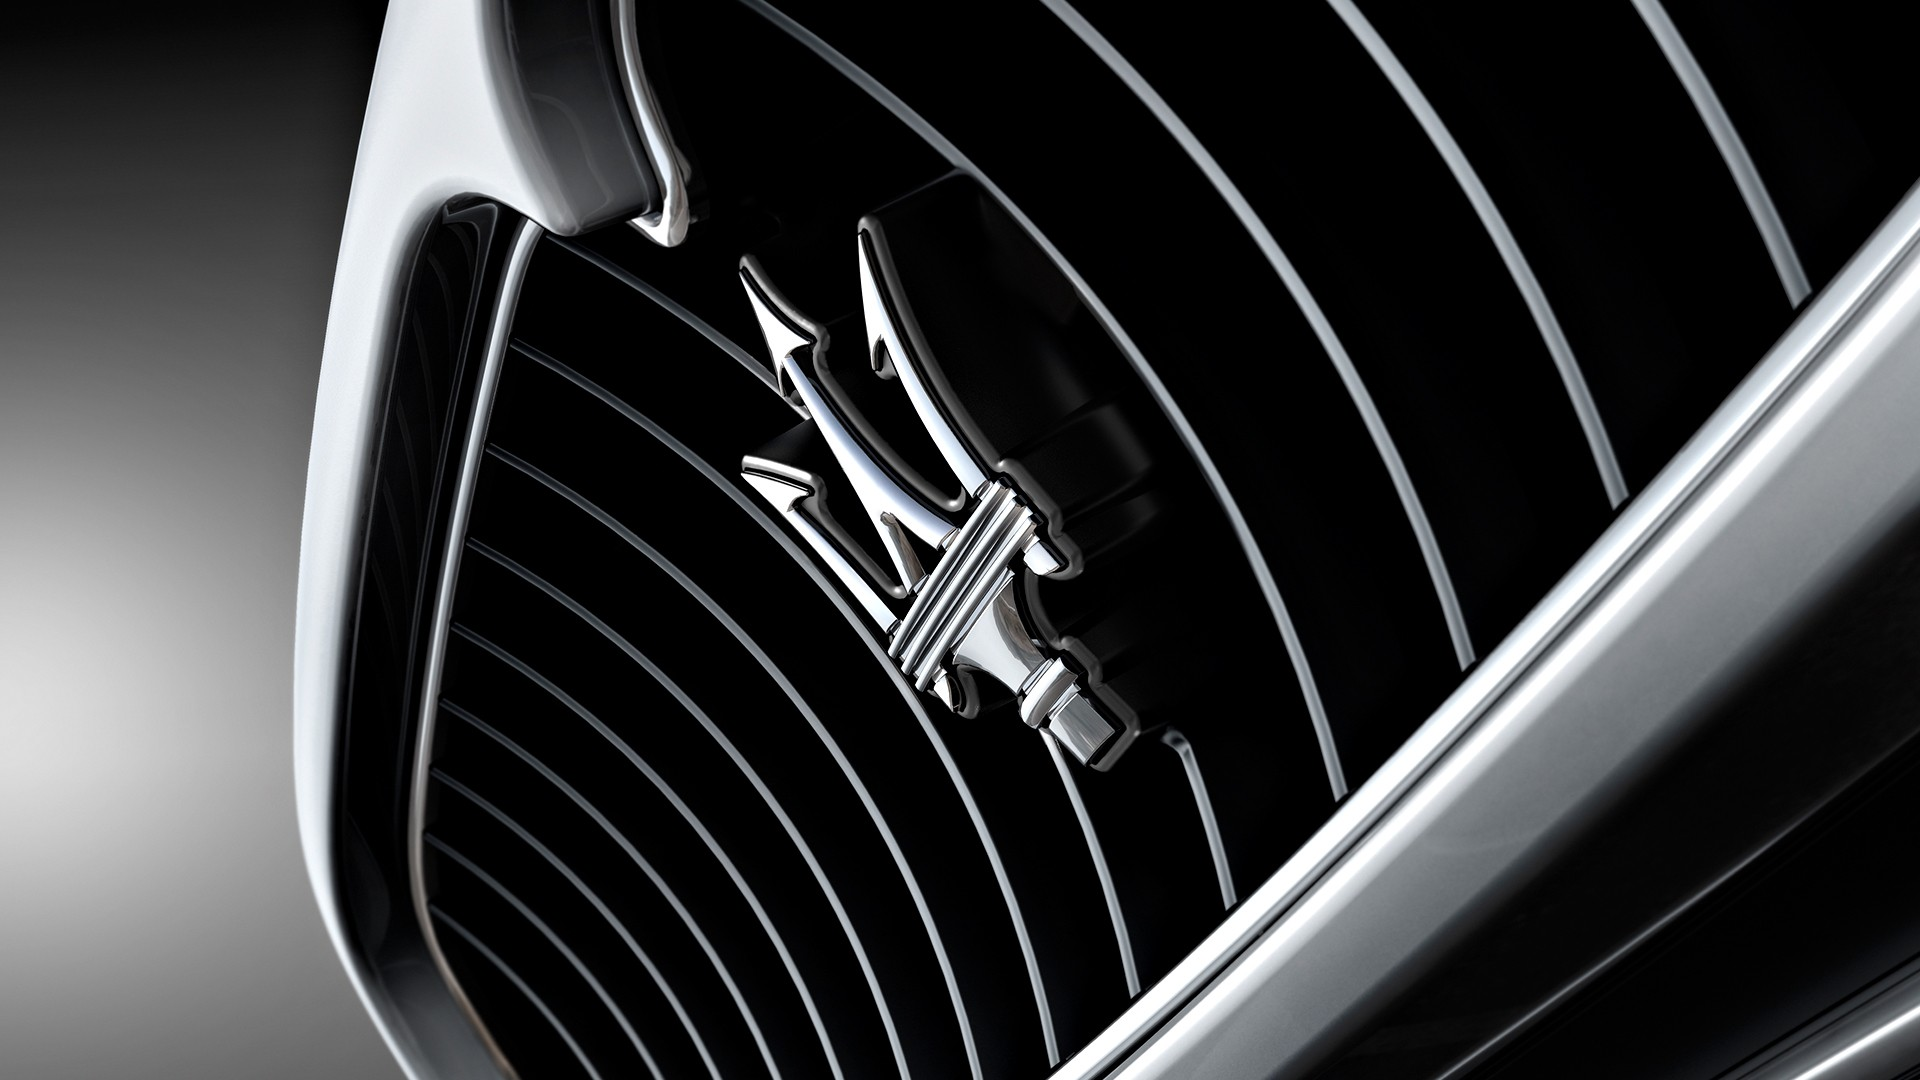 Maserati Car Logo Design Background Hd Wallpaper Maserati 1920x1080